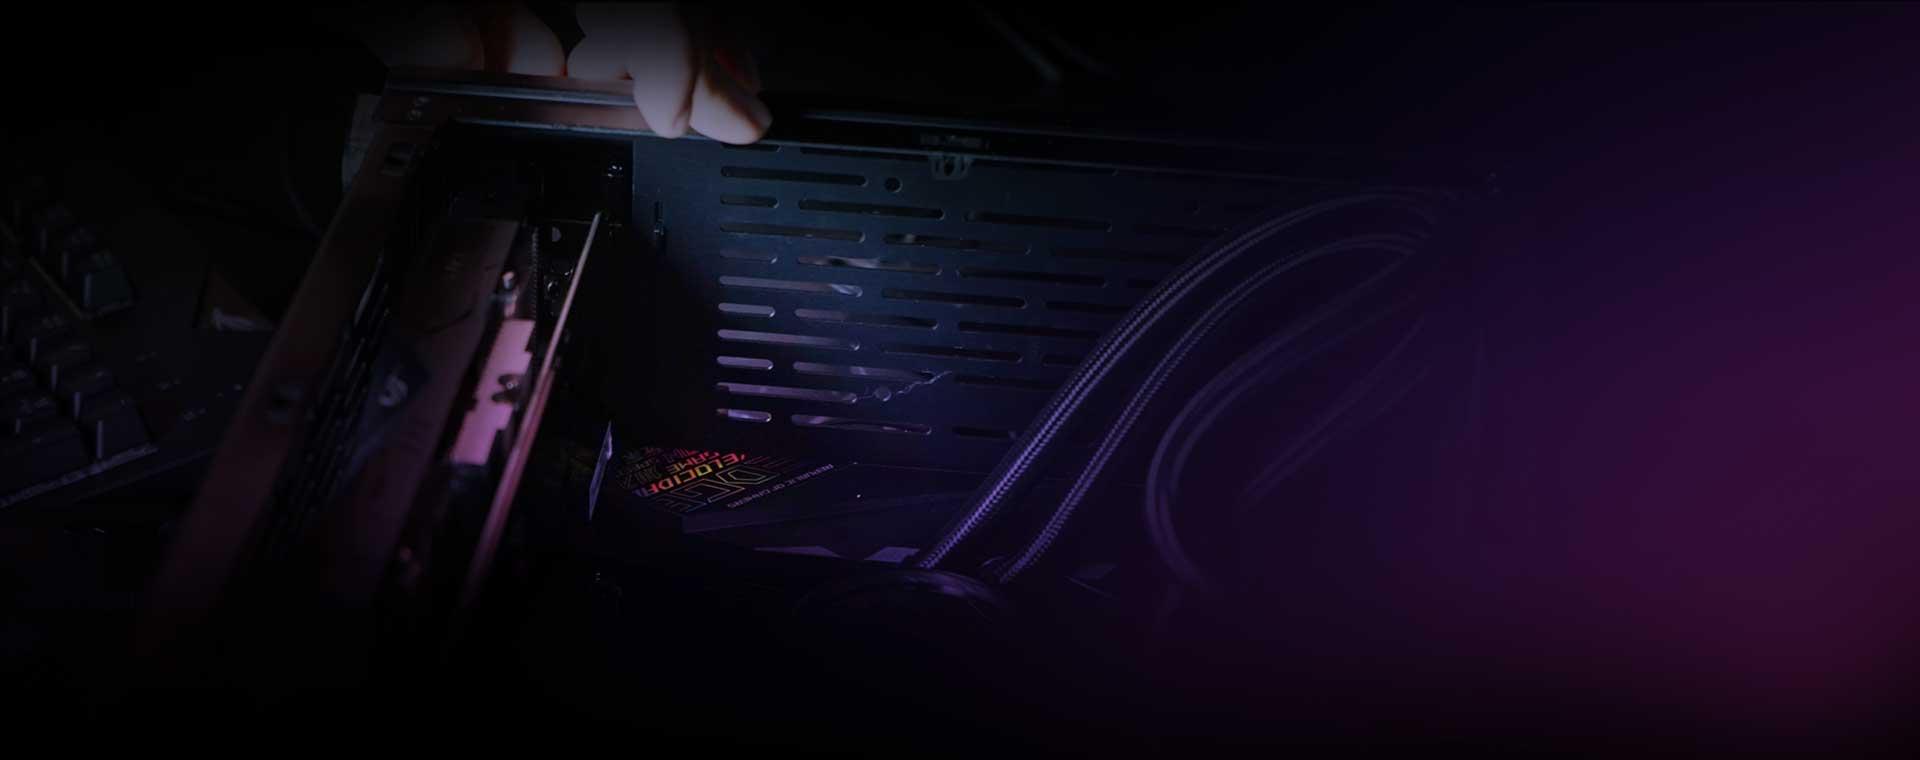 ASUS ROG STRIX Z390-I GAMING | Gaming Motherboard | ASUS USA